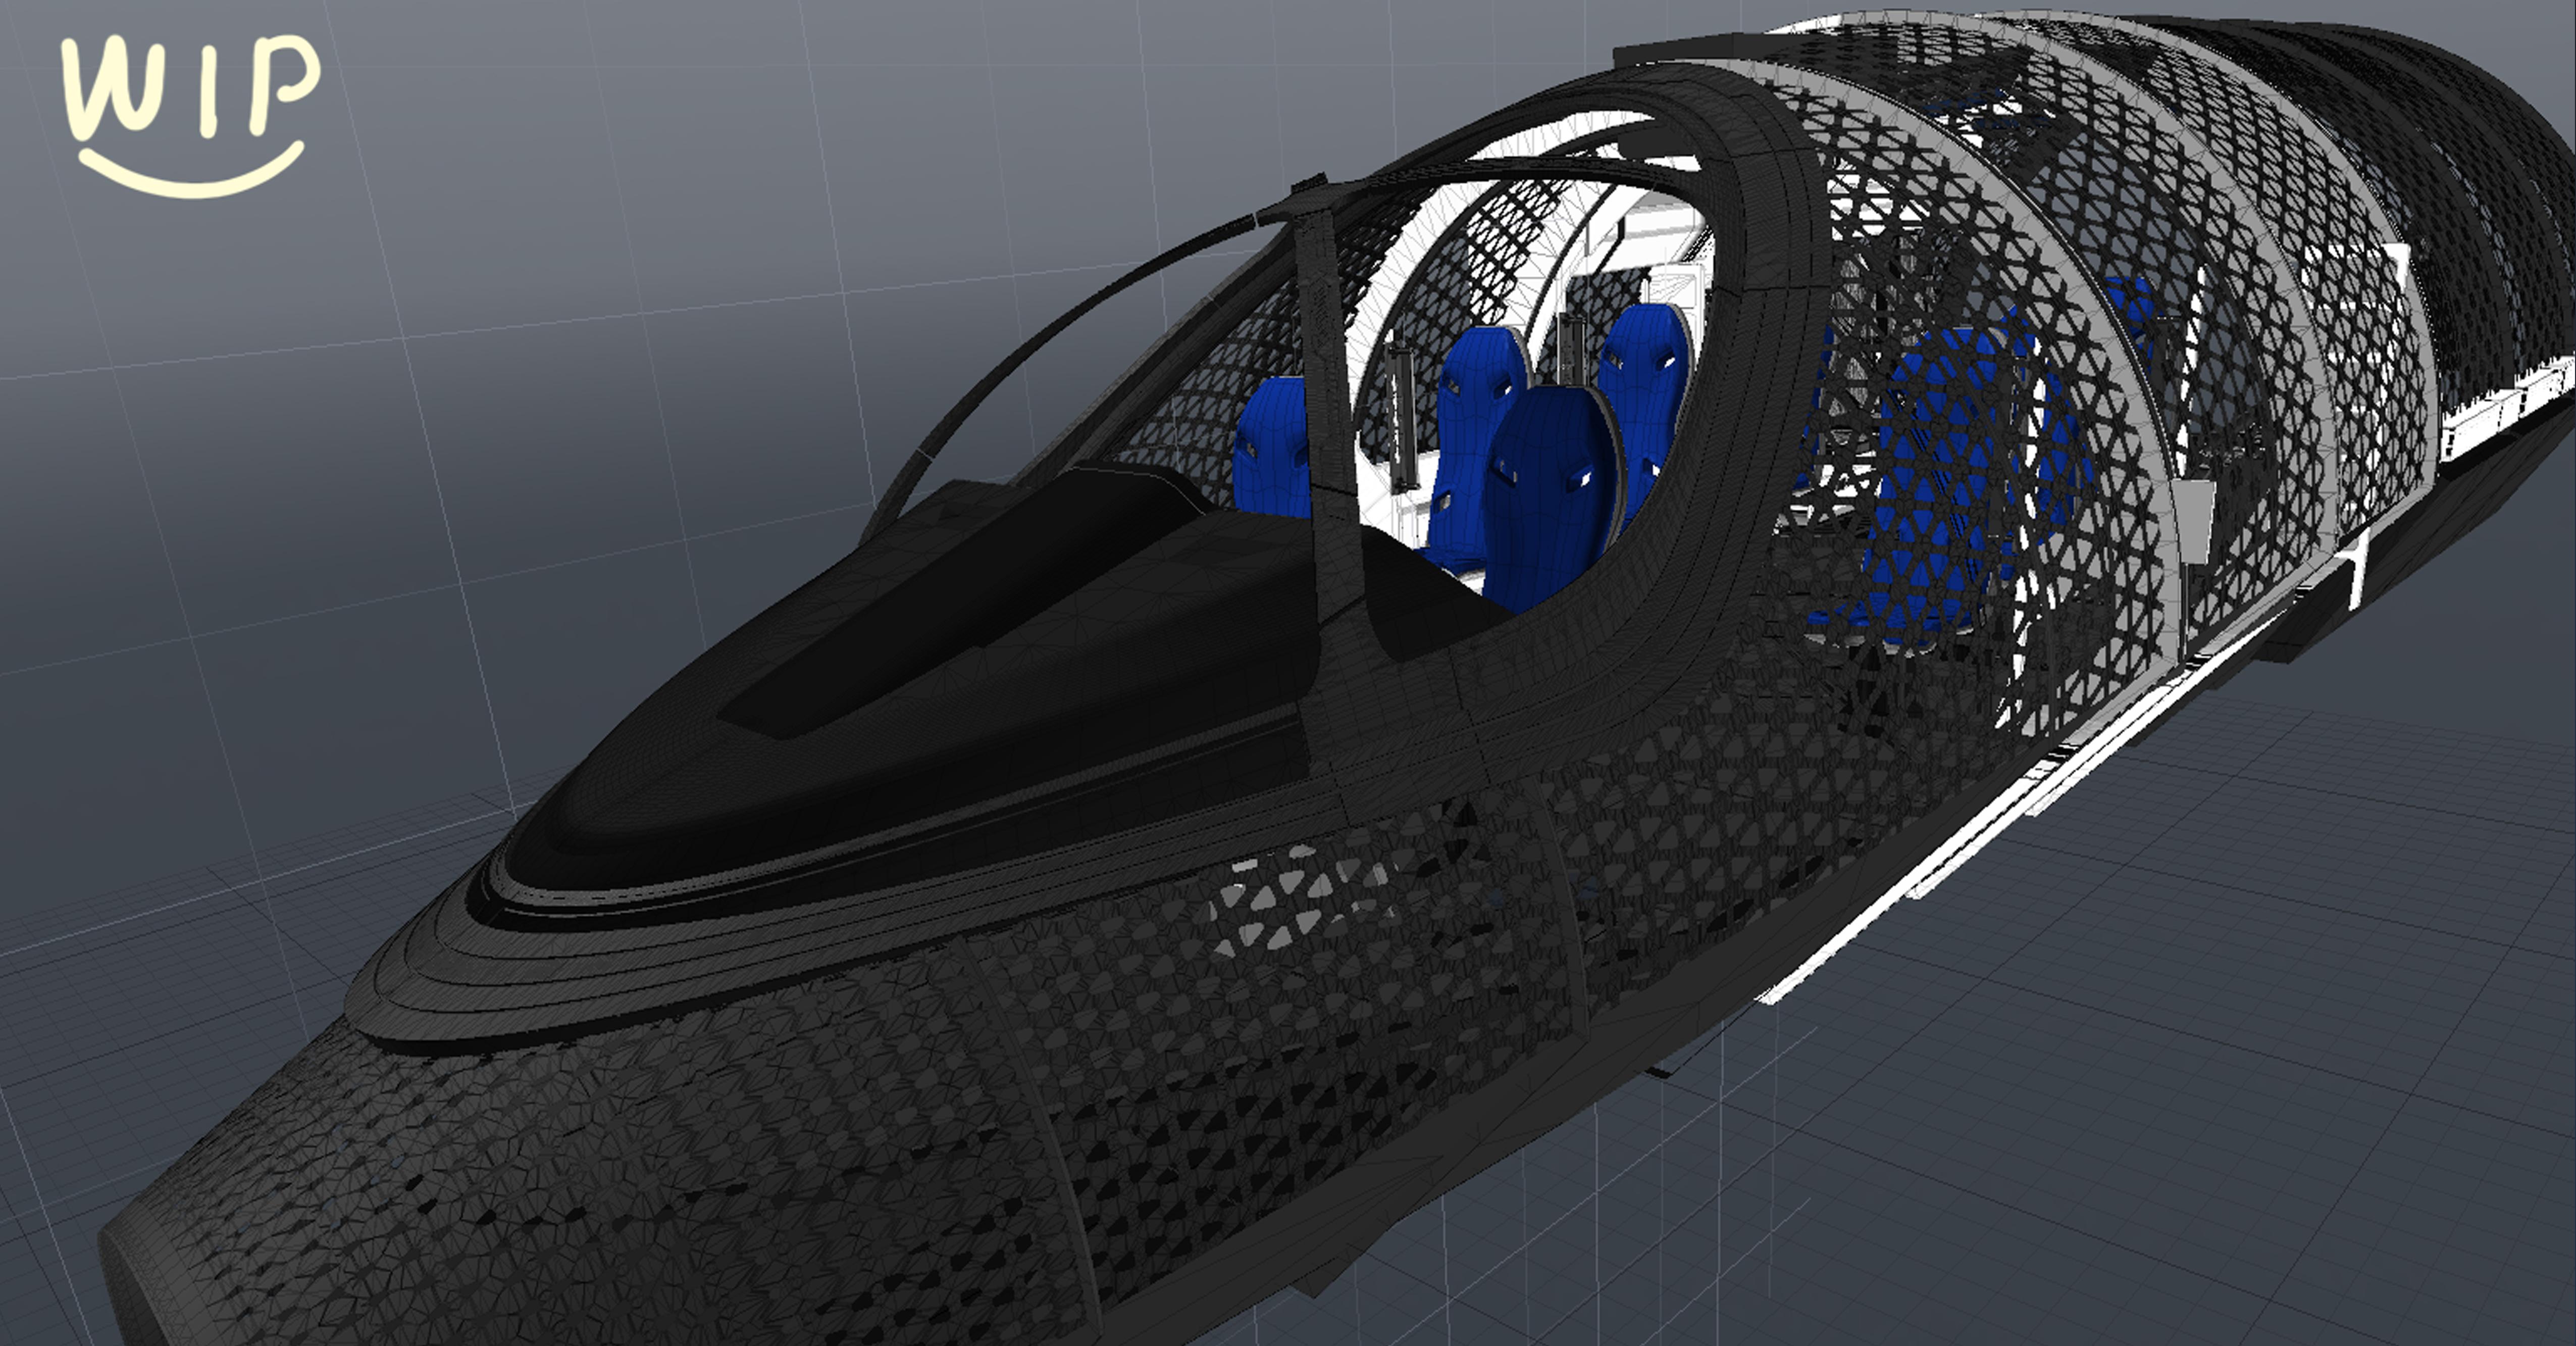 X-jet Design